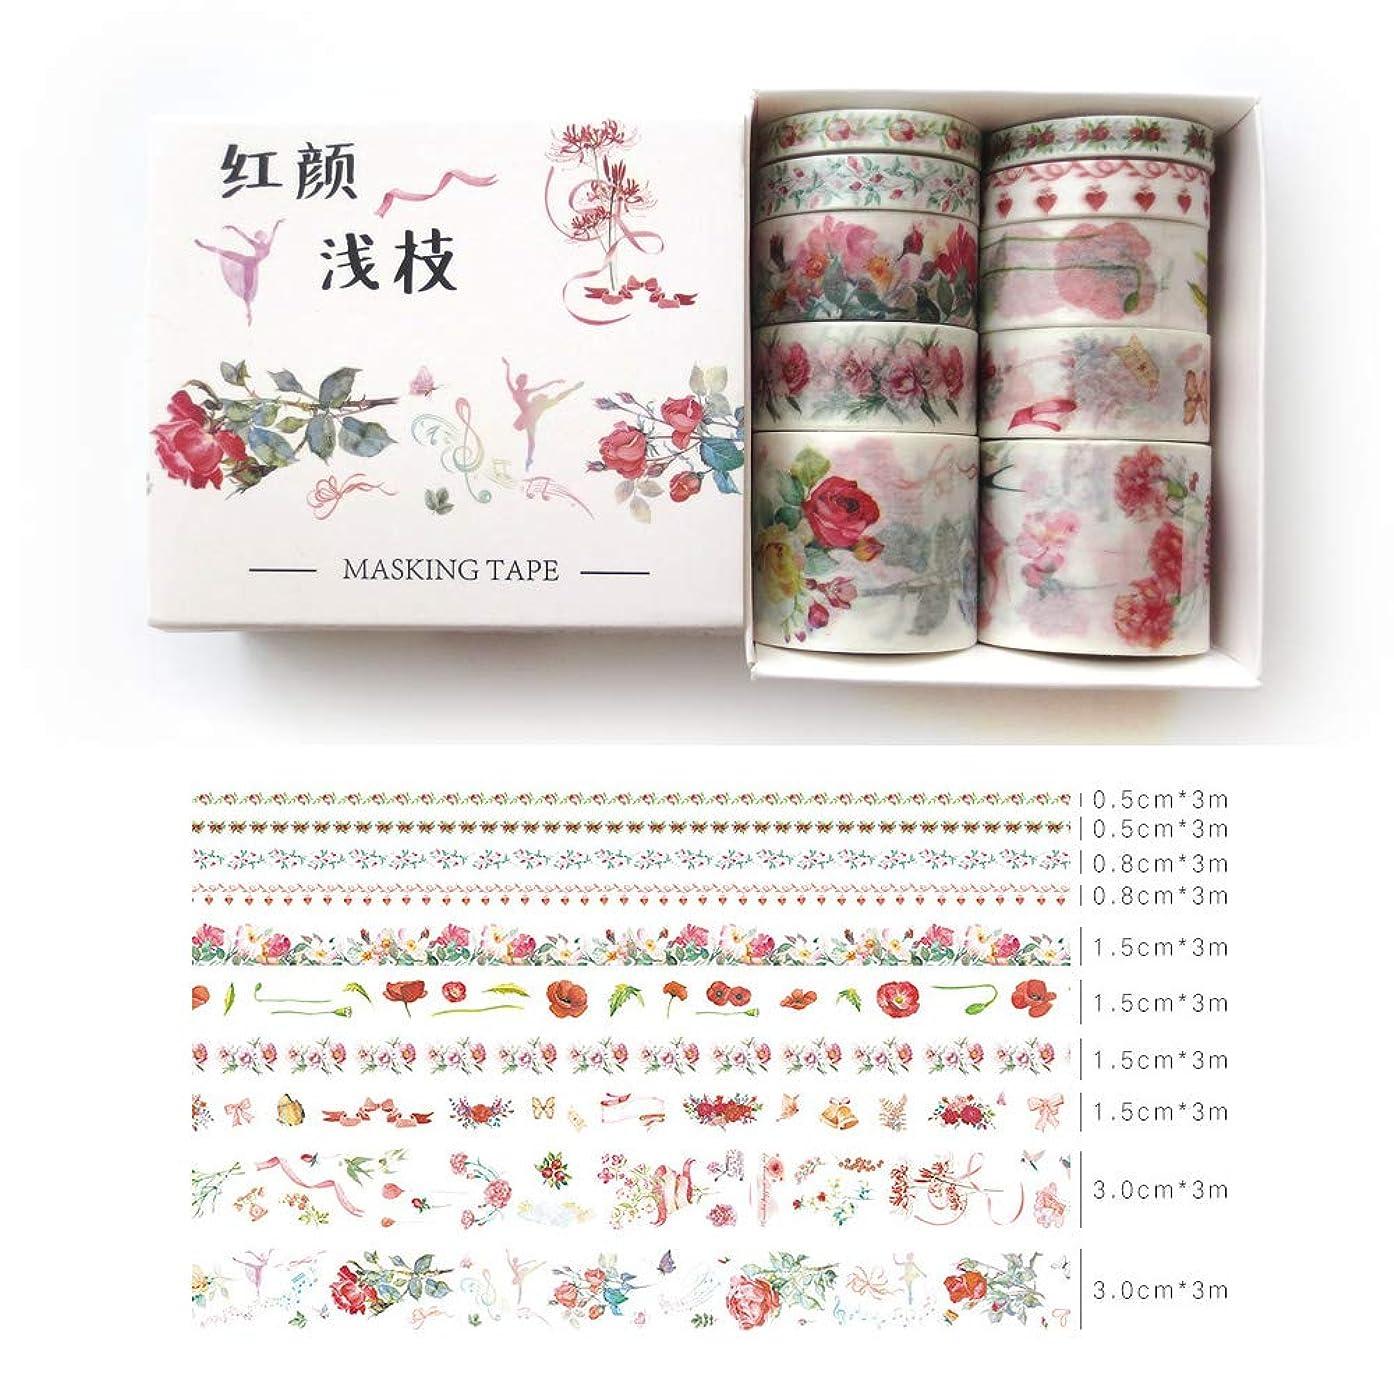 DzdzCrafts 10 Rolls Red Blossom Flower Floral Decorative Washi Tapes Set for Scrapbooking Dairy Planner Album (0.5cm 0.8cm 1.5cm 3cm Wide x 3M Each)